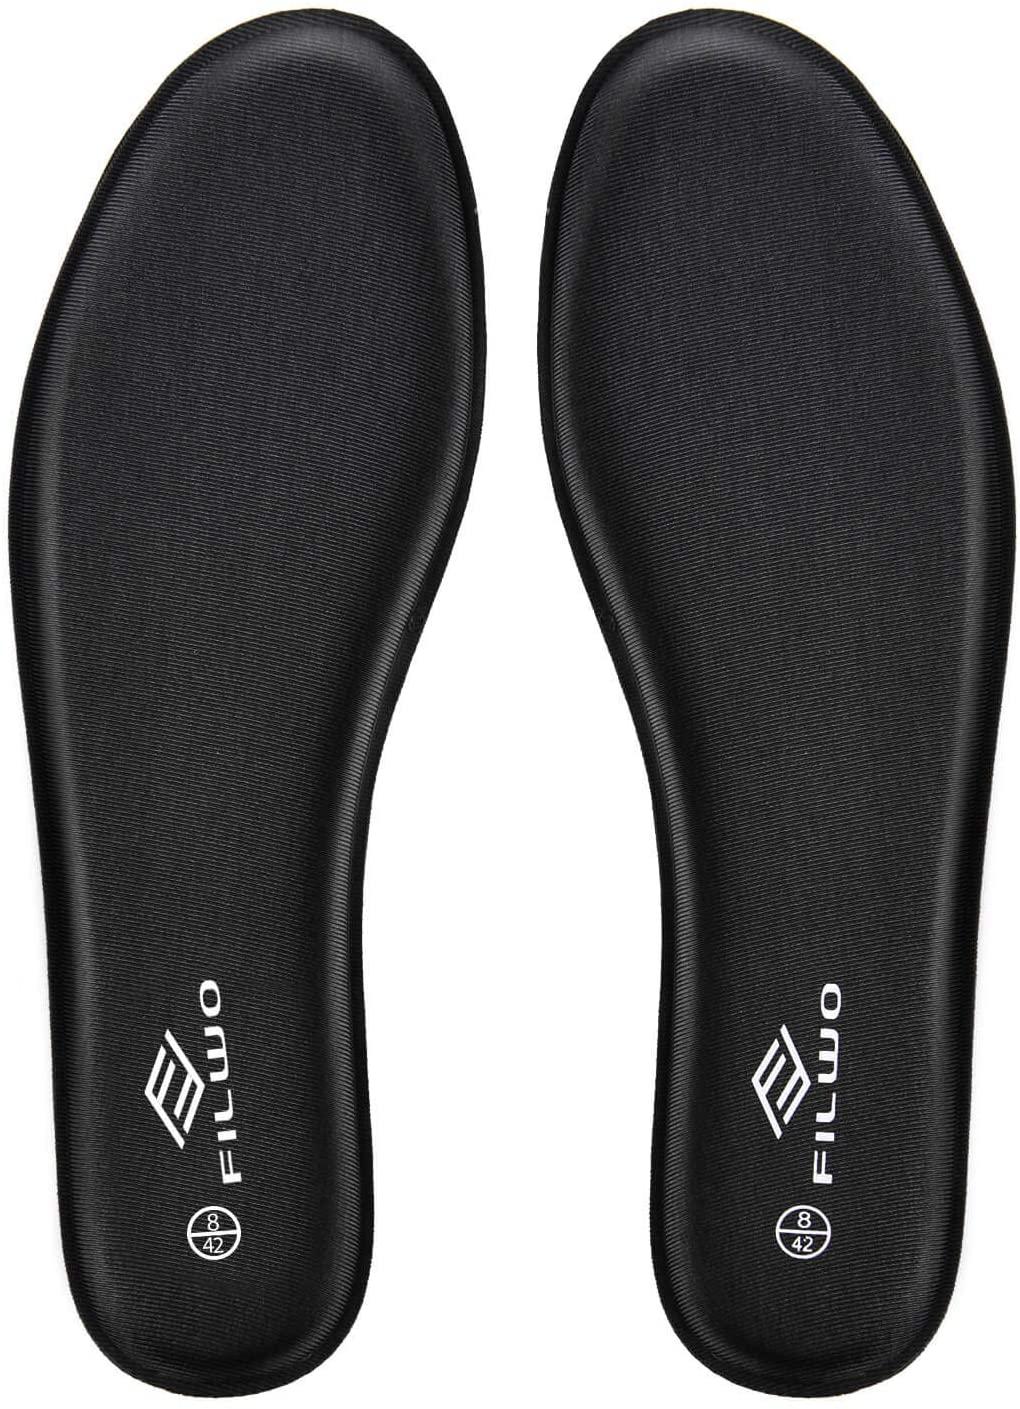 FILWO Memory Foam Shoe Inserts - Men Comfortable Replacement Shoe Inserts, Premium Soft Cushioning Shoe Insoles for Heel Pain, Running, Walking, Working, Sport, Trainers, Hiking 11M US Black